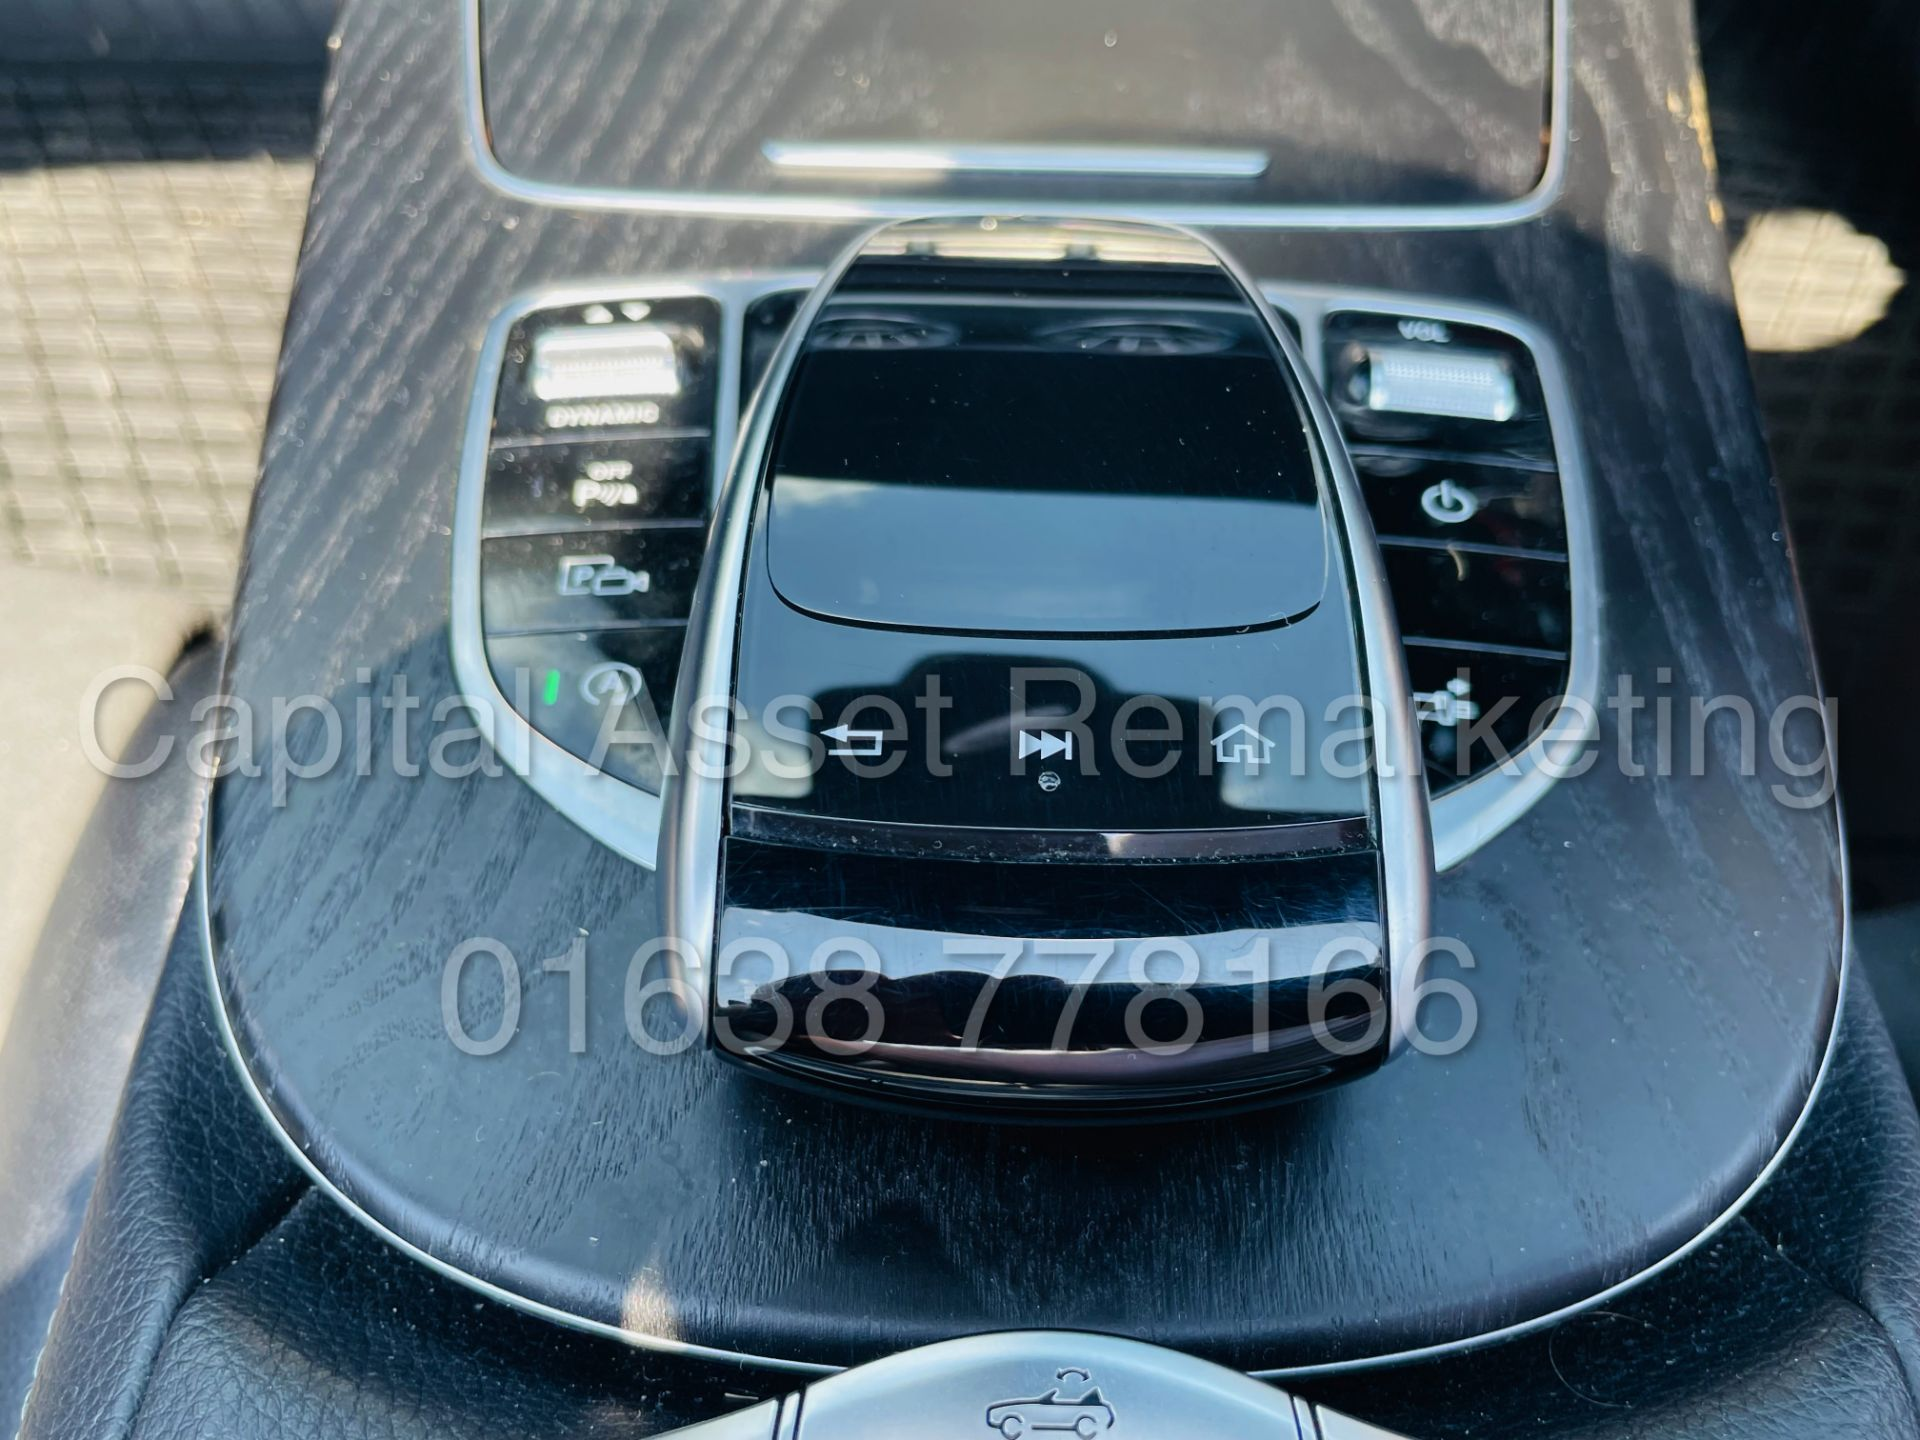 MERCEDES-BENZ E220d *AMG LINE PREMIUM - CABRIOLET* (2018 - EURO 6) '9G AUTO - LEATHER - SAT NAV' - Image 58 of 63